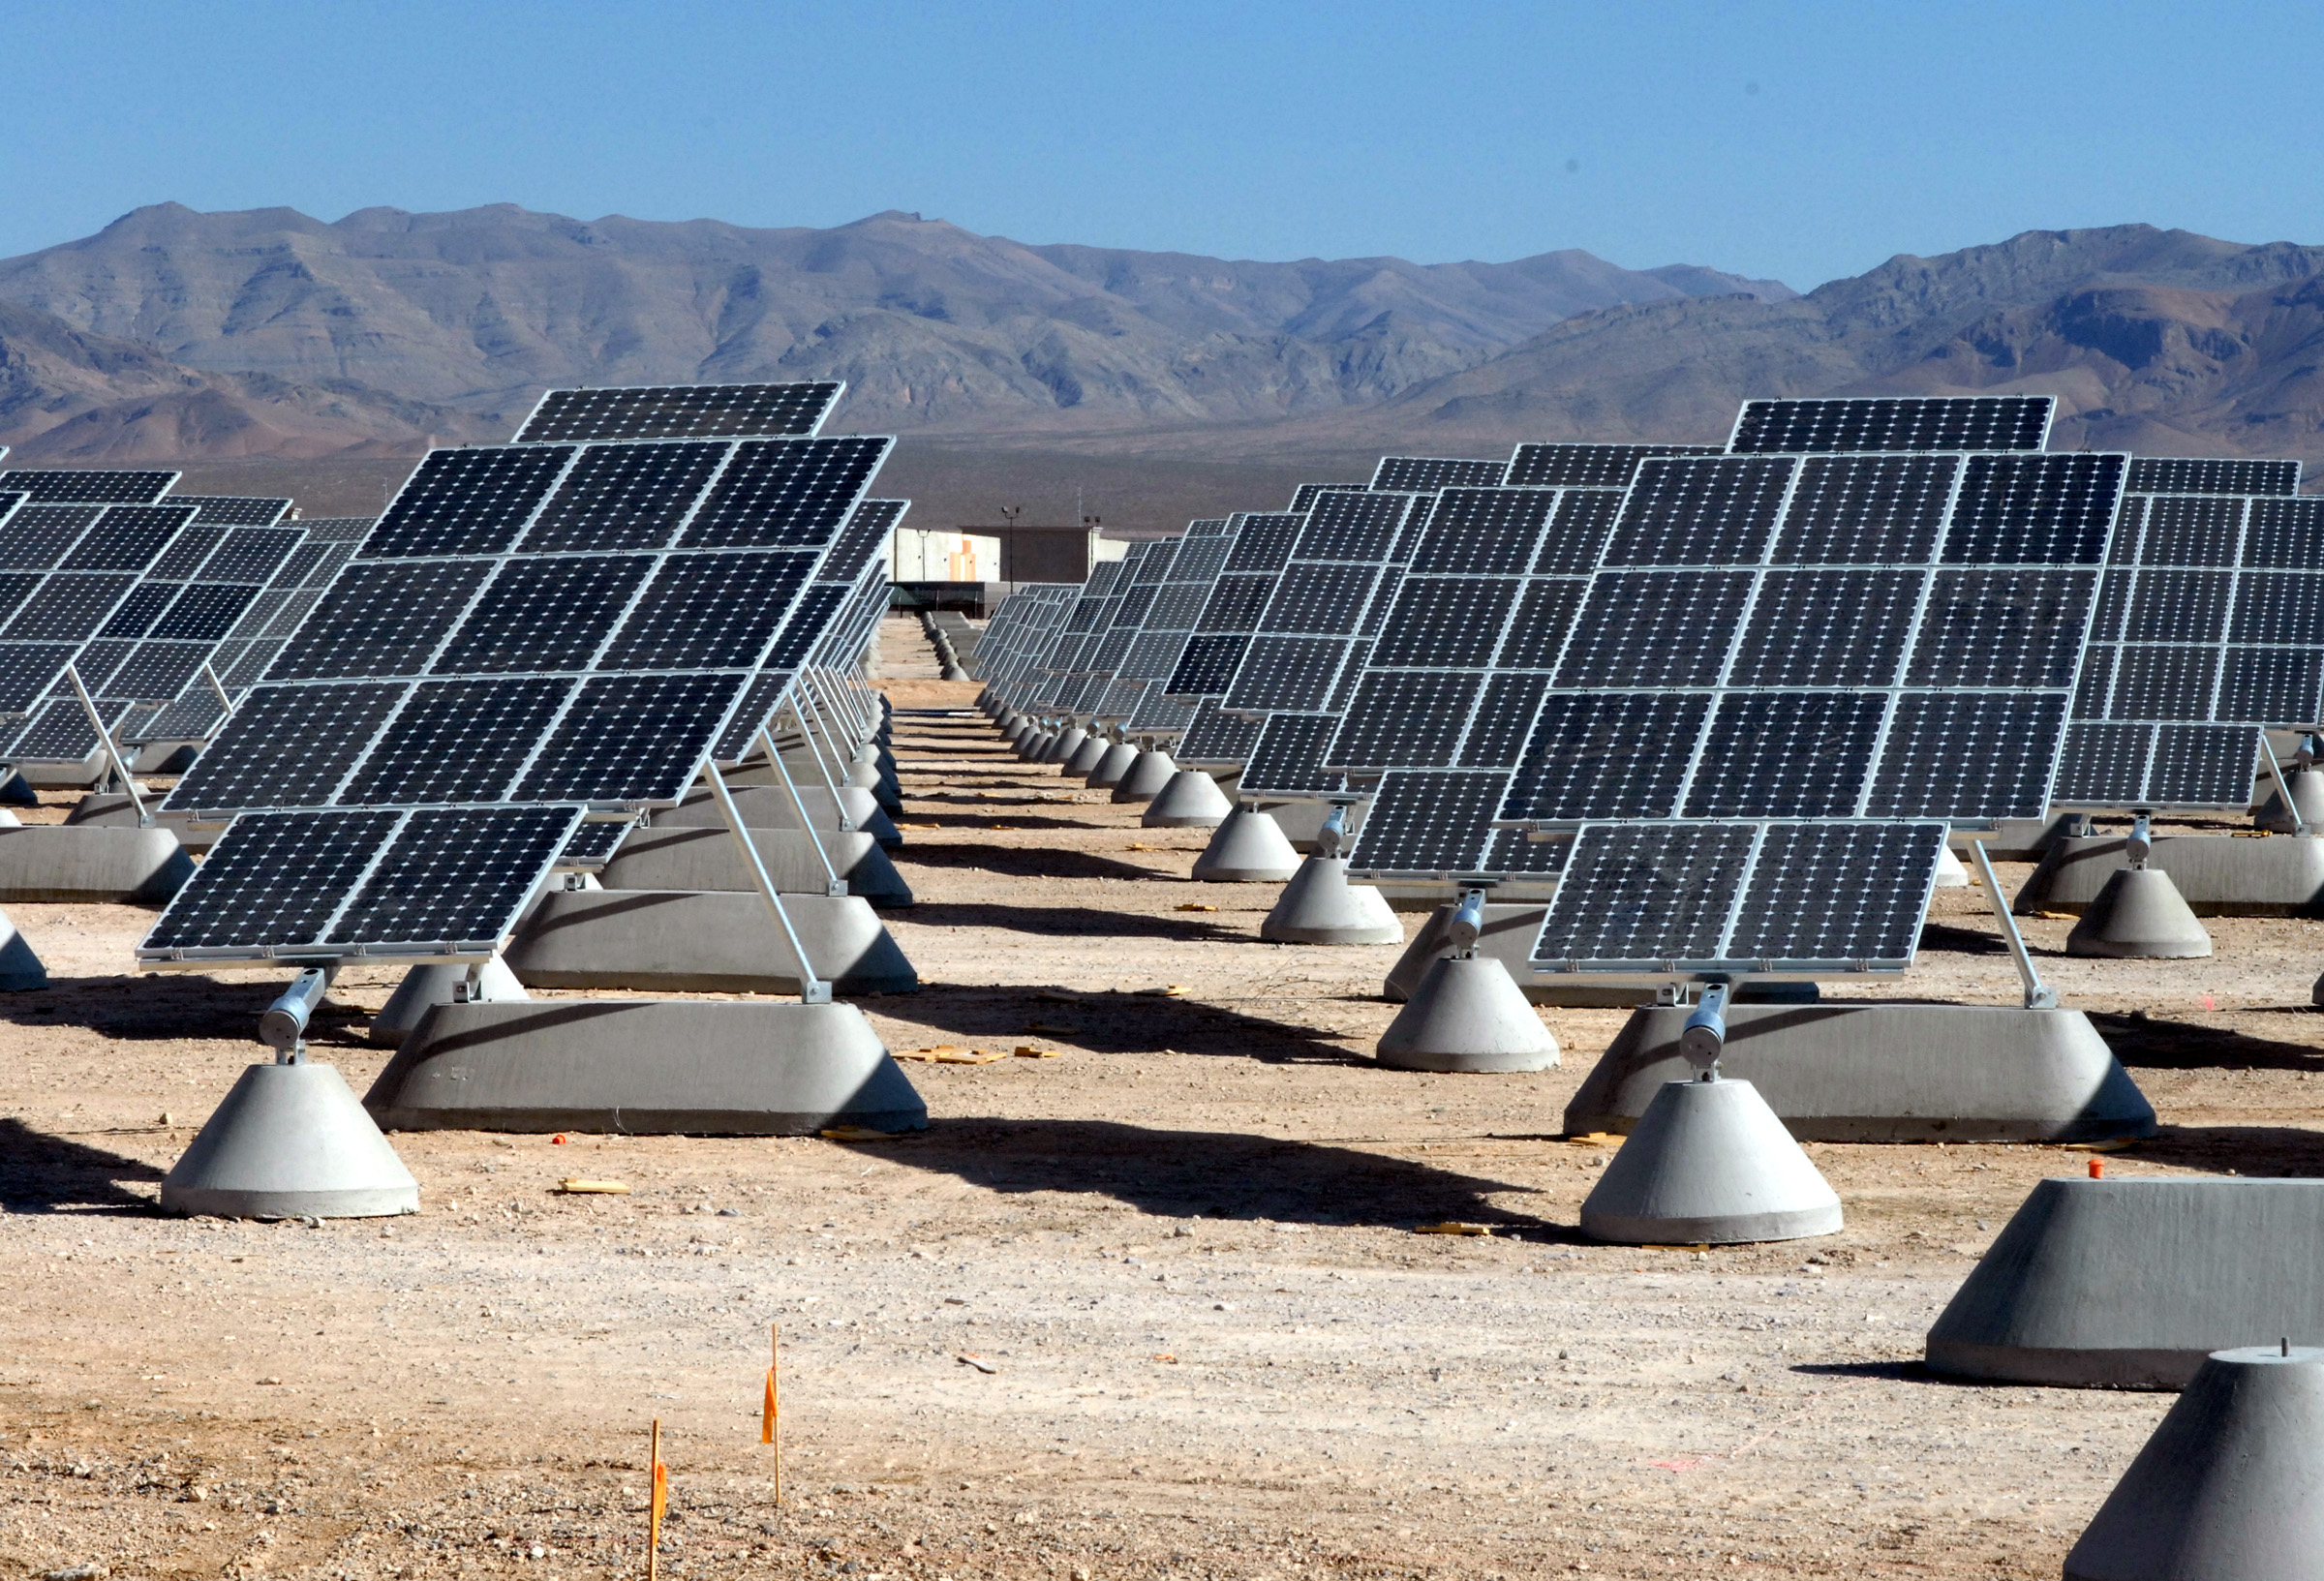 Nellis Airforce, Nevada using Solar Power